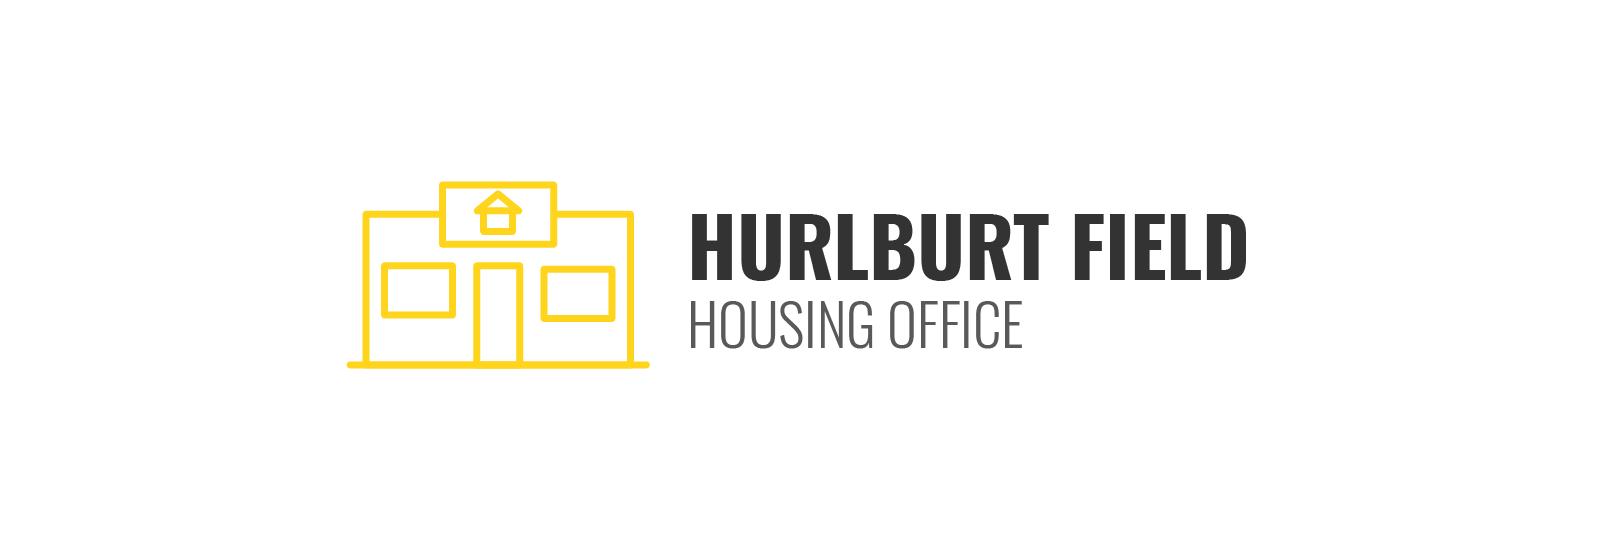 Hurlburt Field Housing Office